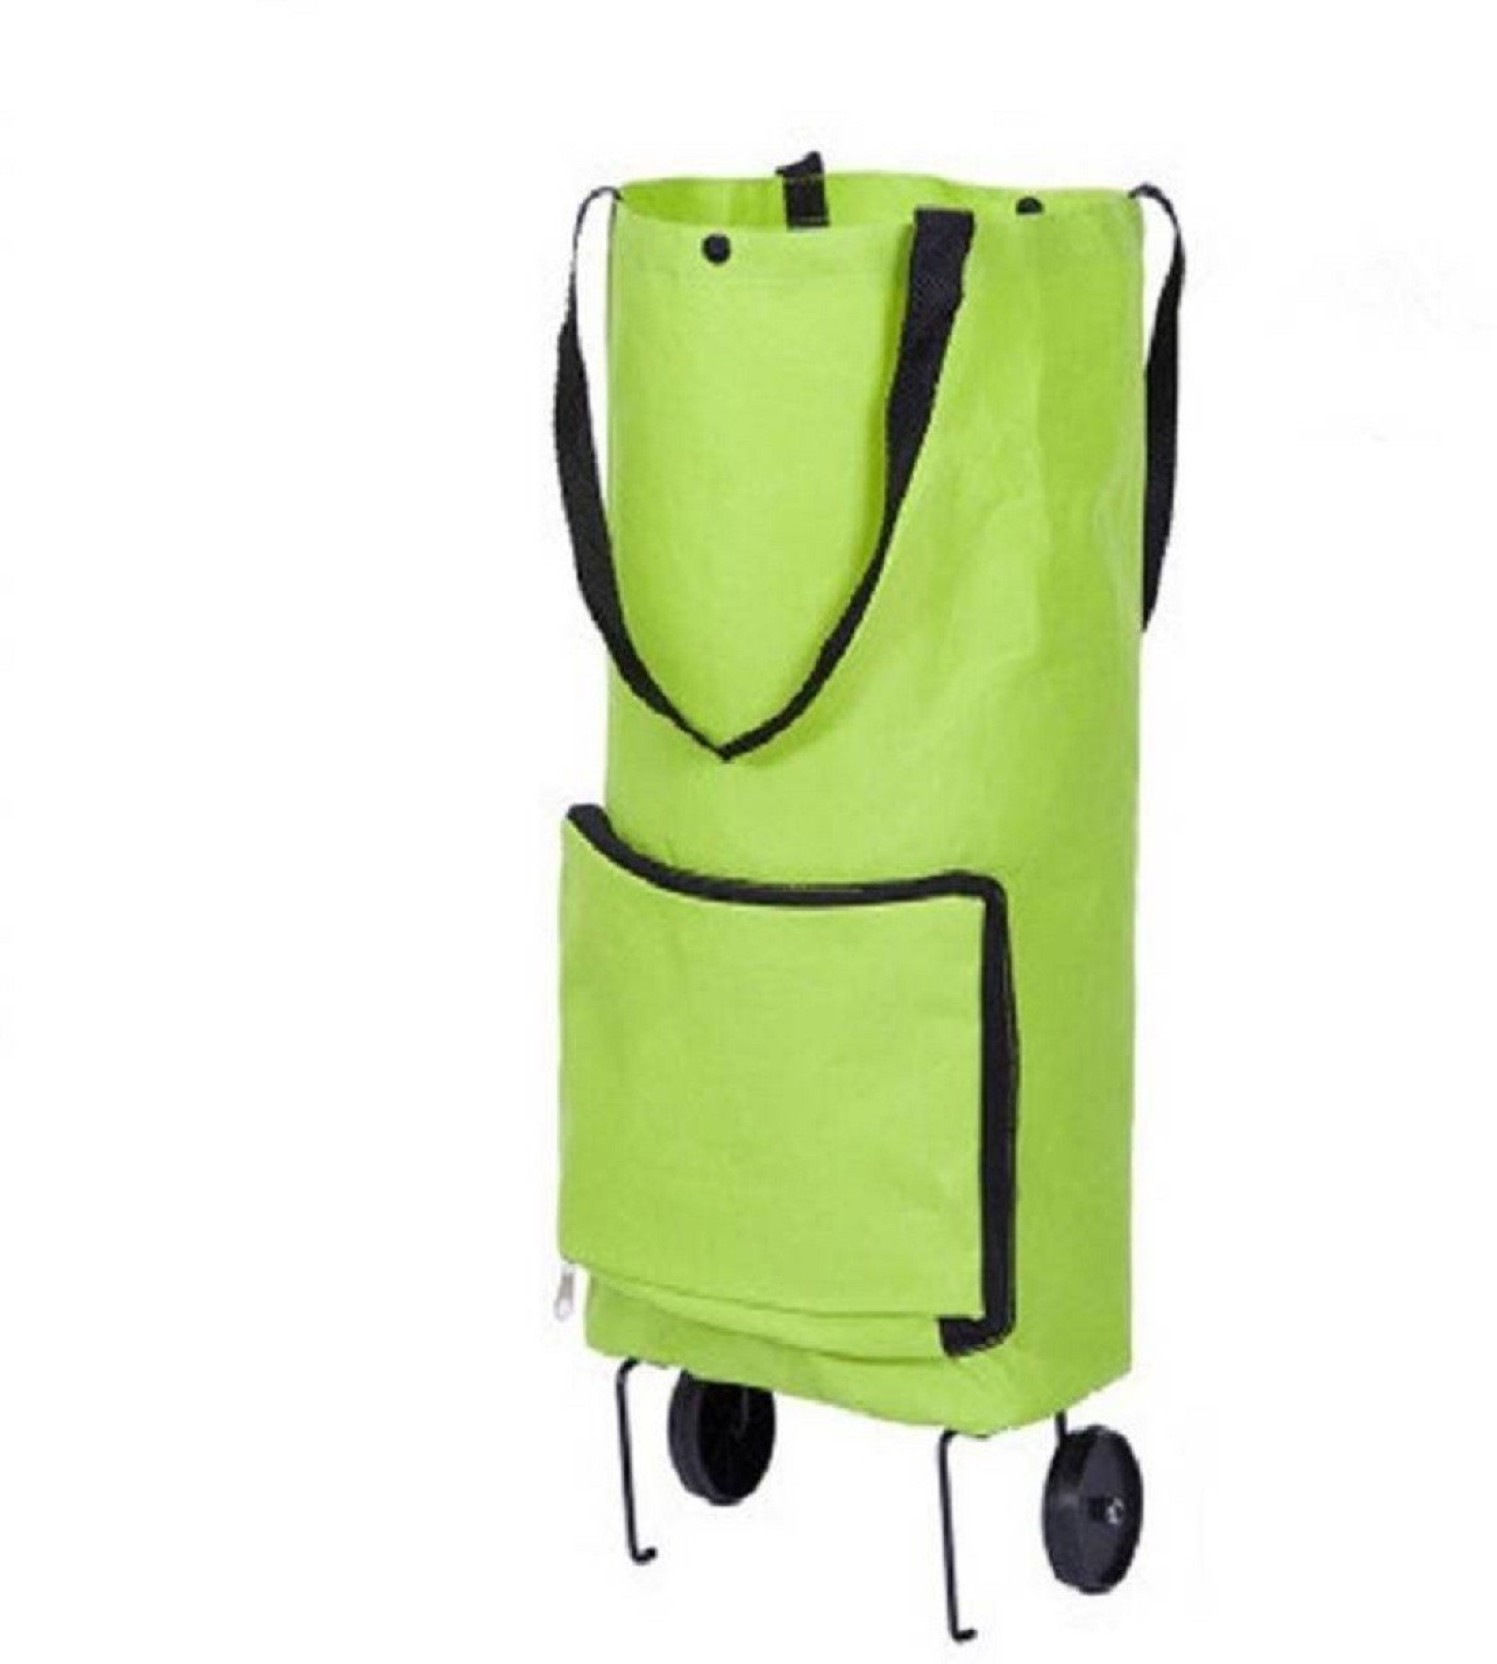 58e92d201558 Buyerzone 2 Wheel Shopping Trolley, Lightweight Folding Travel Bag ...